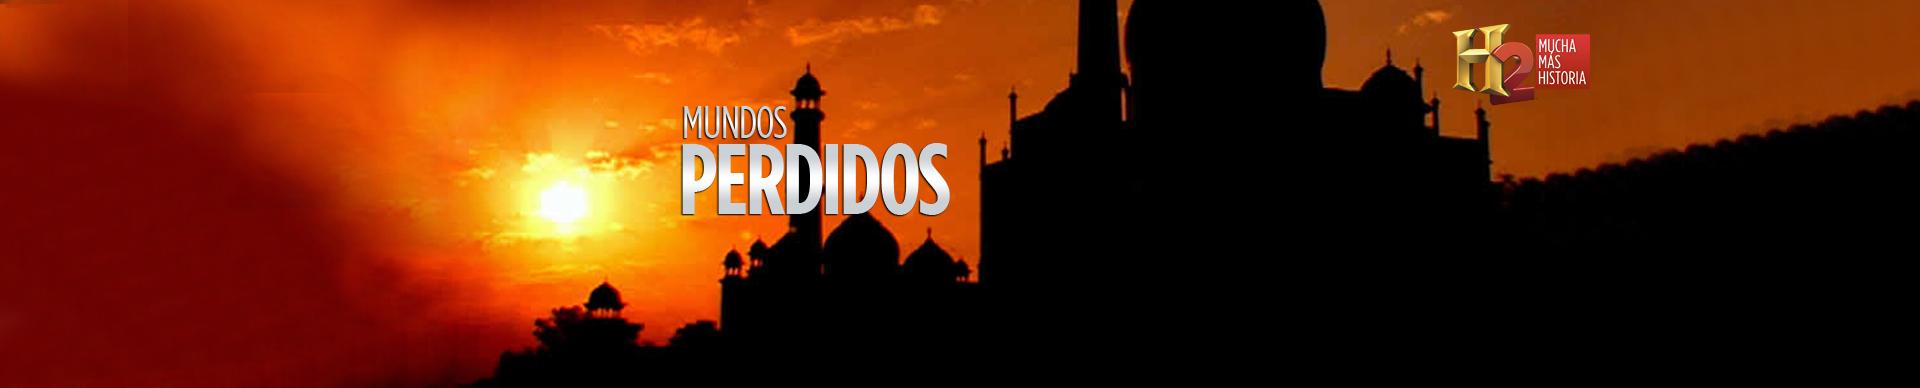 MUNDOS PERDIDOS